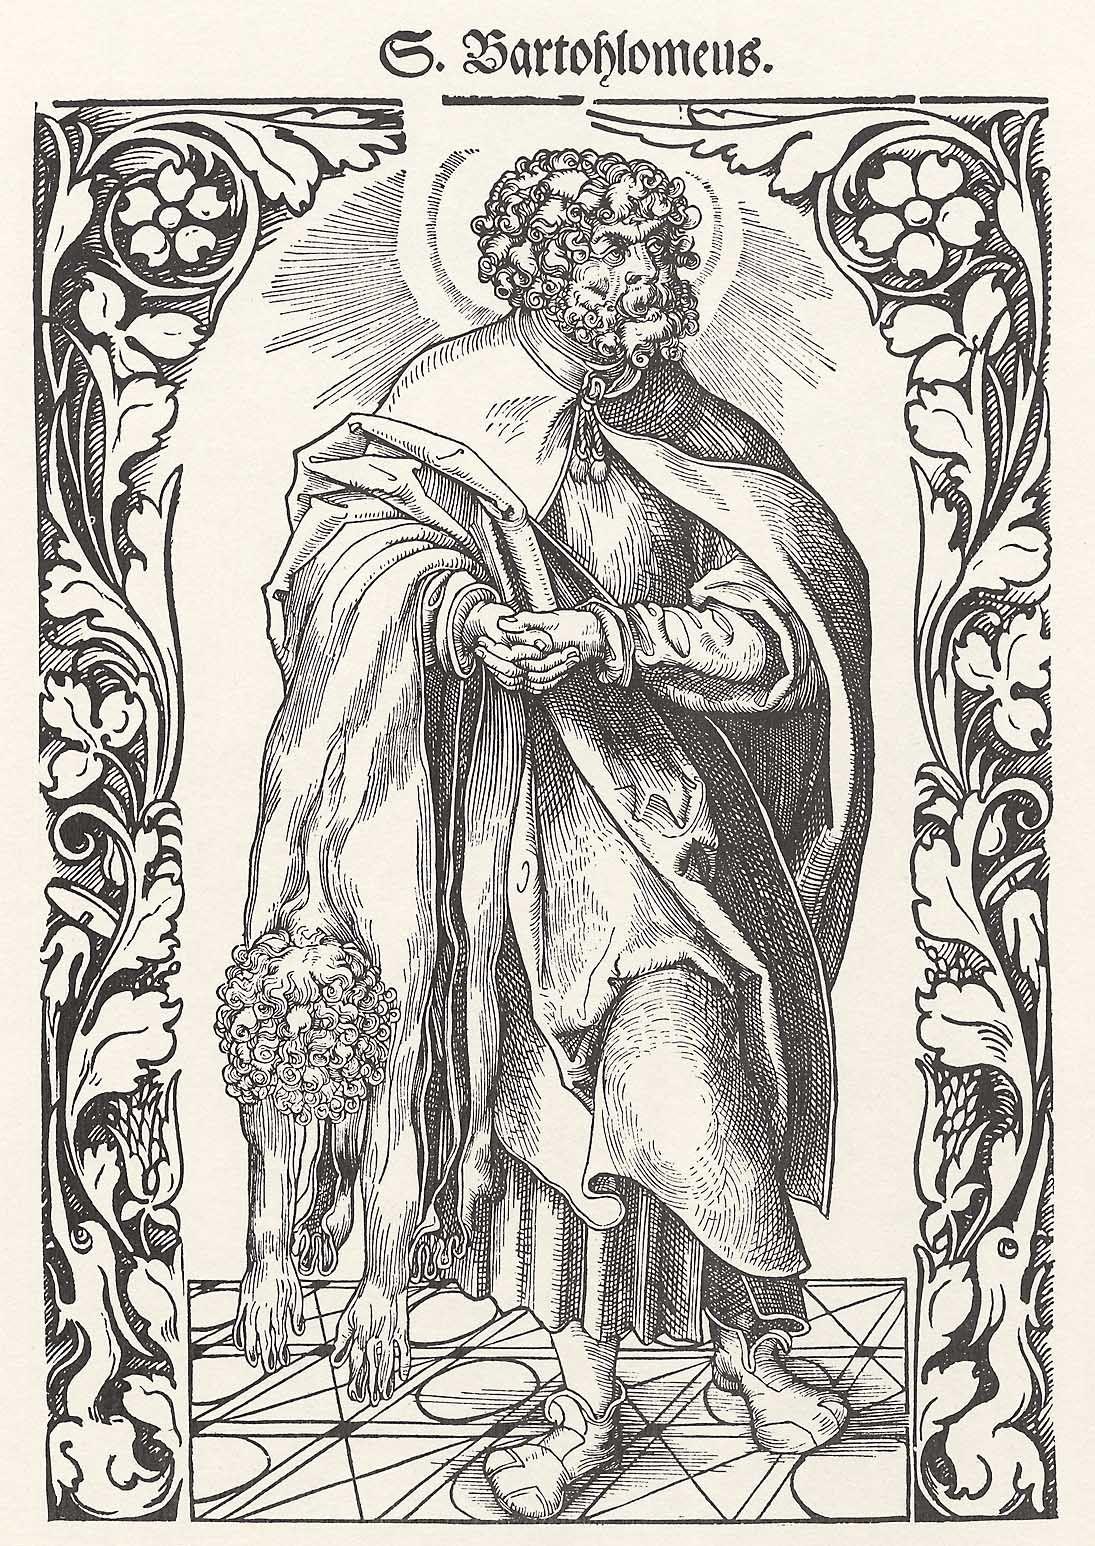 Weiditz, Hans: Hl. Bartholomäus in einem Ornamentrahmen - Zeno.org